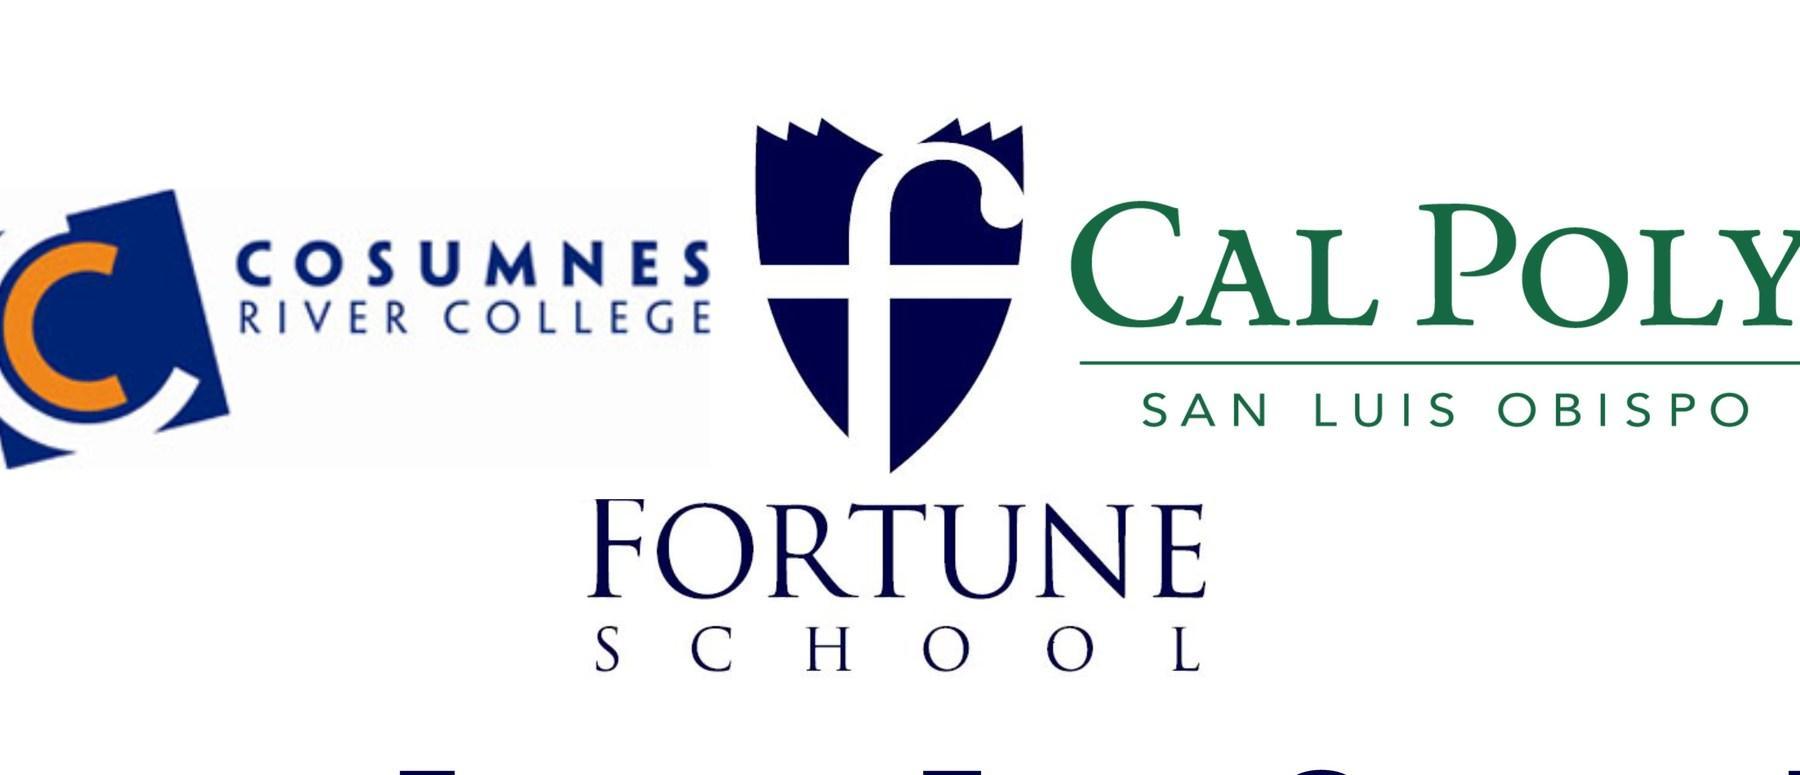 Partnership: Cosumnes River College & Cal Poly San Luis Obispo